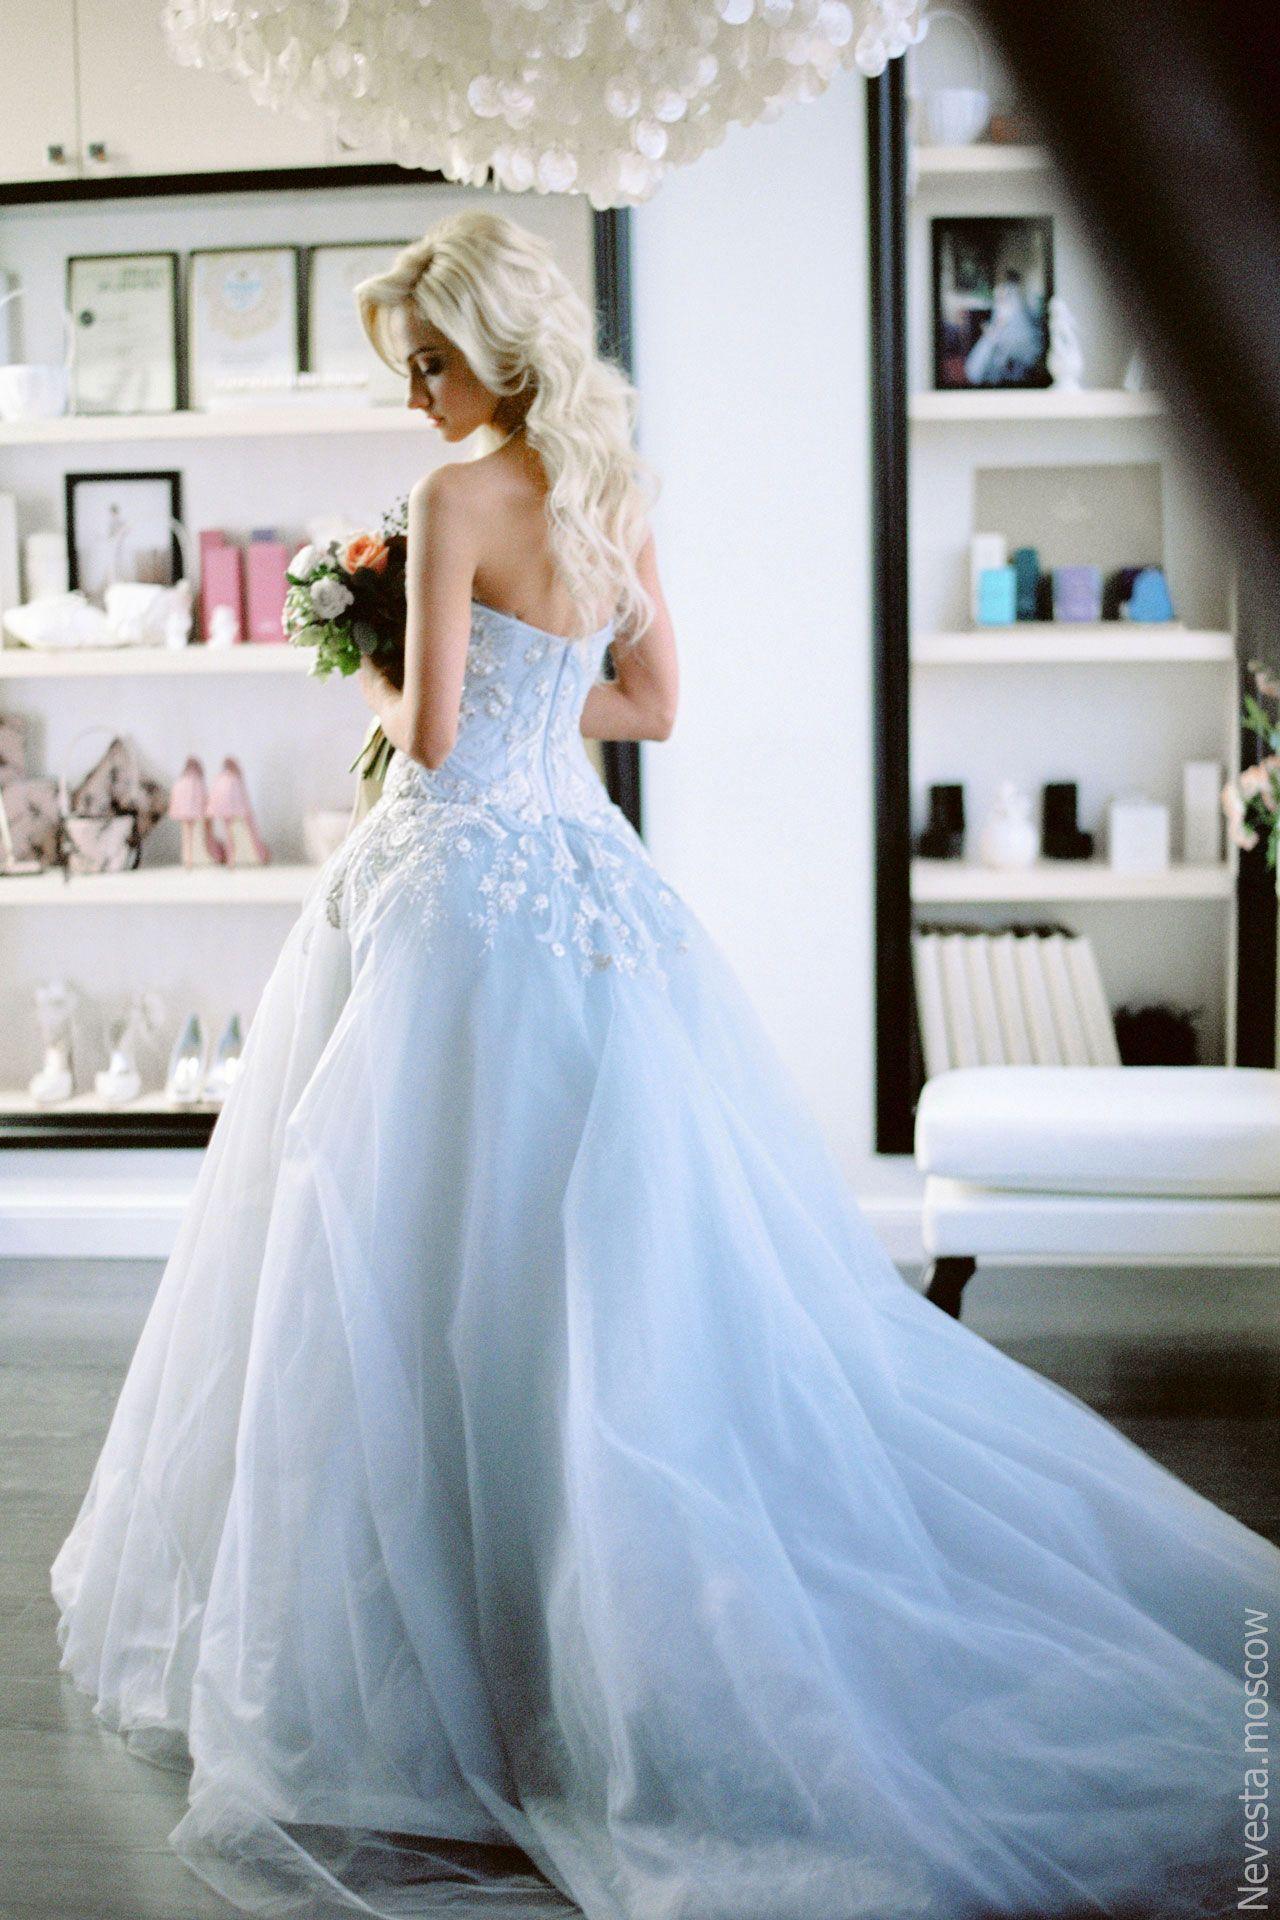 актриса Полина Максимова в свадебном платье невеста фото 3